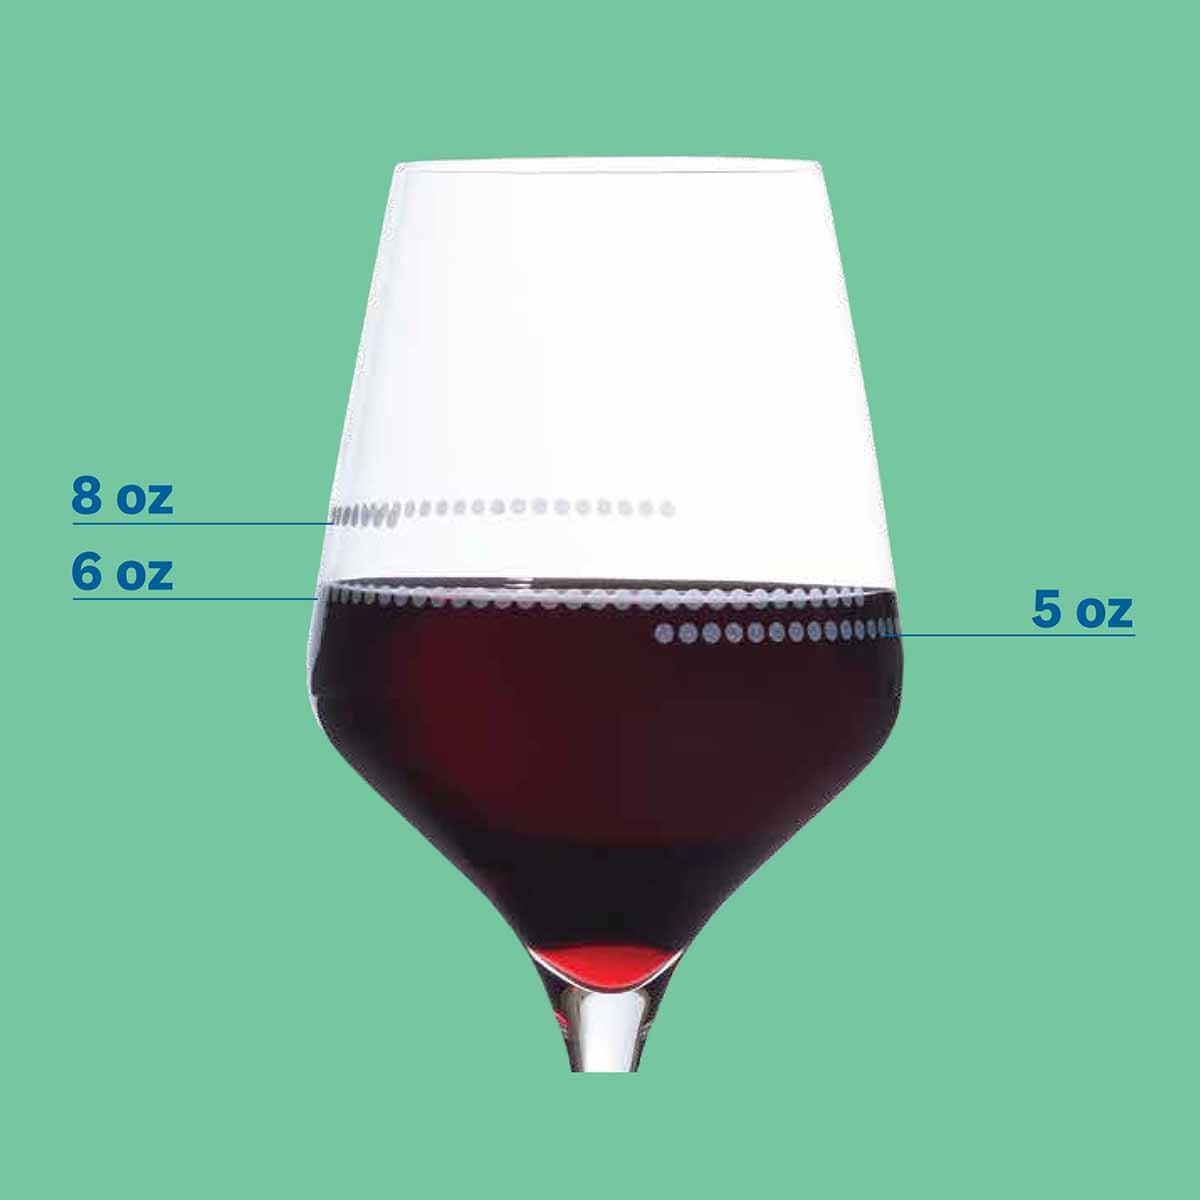 wine glass detail